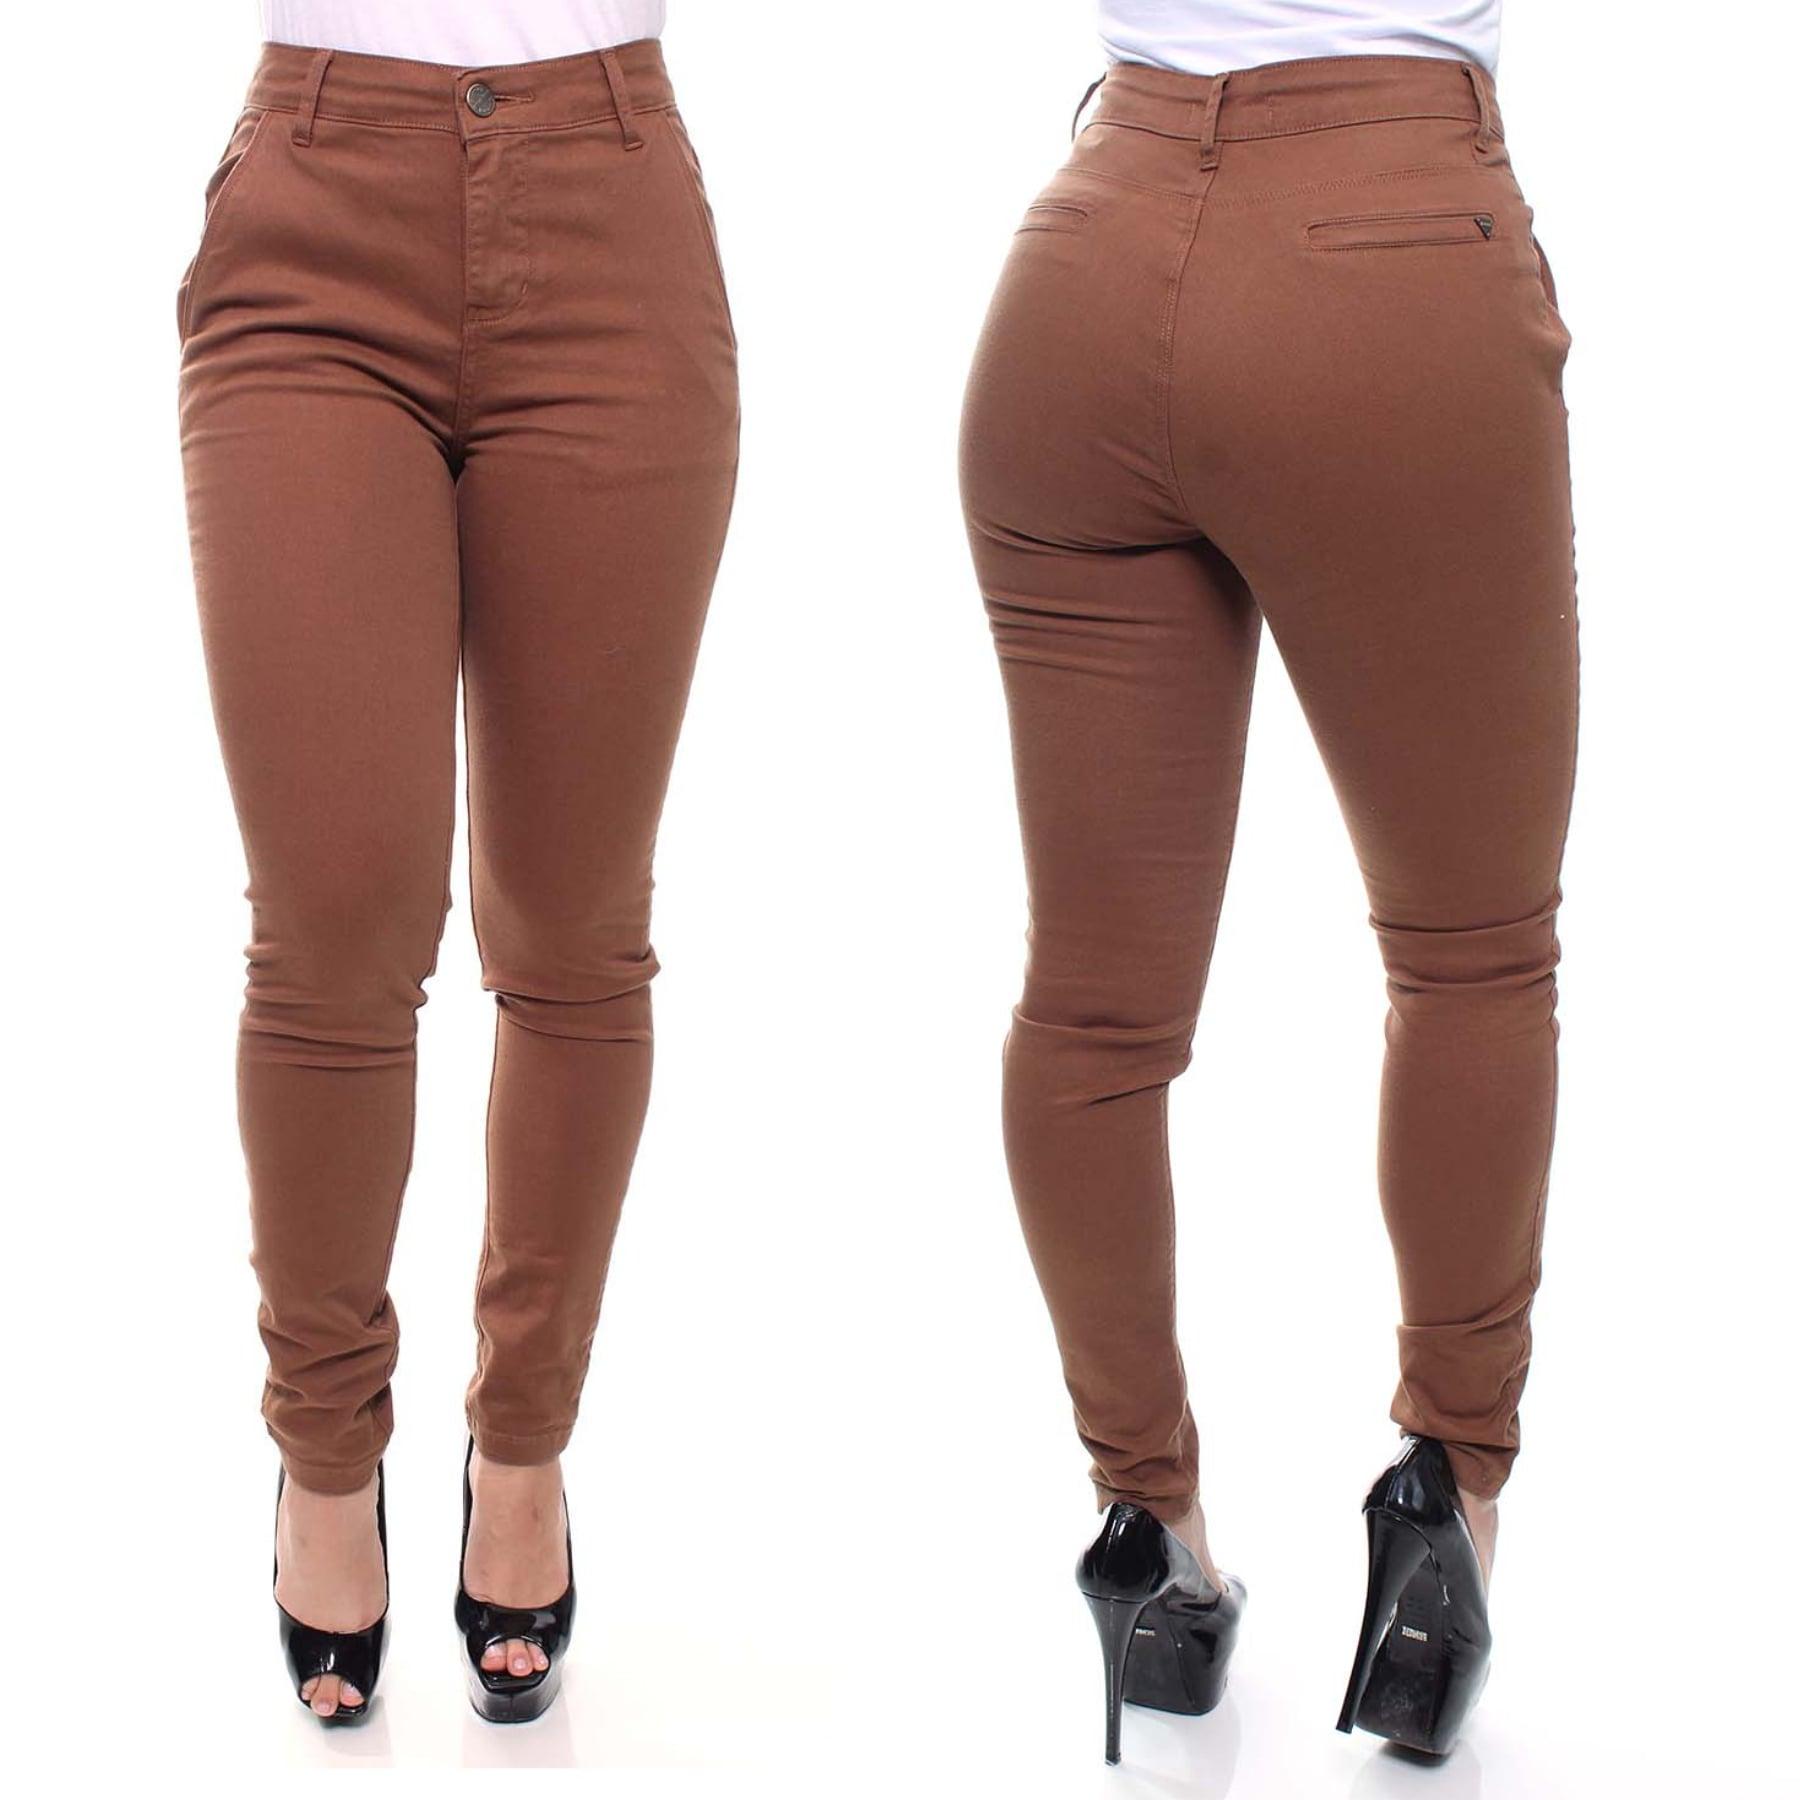 Calça Jeans Feminina Esporte Fino Cor Marrom Crocker